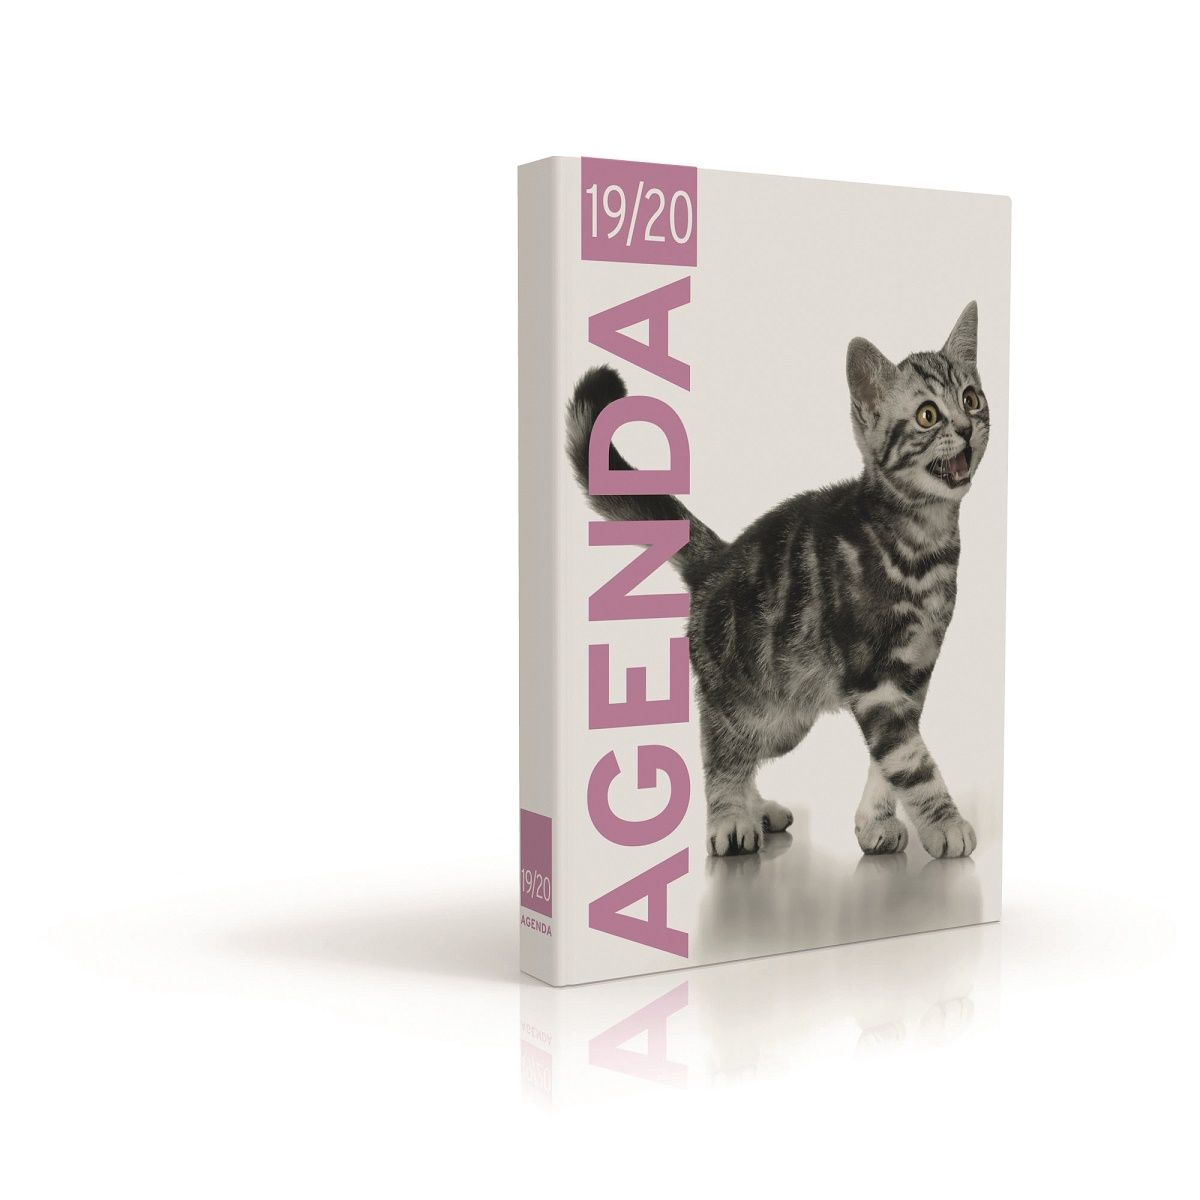 Agenda scolaire journalier 1er prix 320 pages 119x163cm chaton 2019 2020